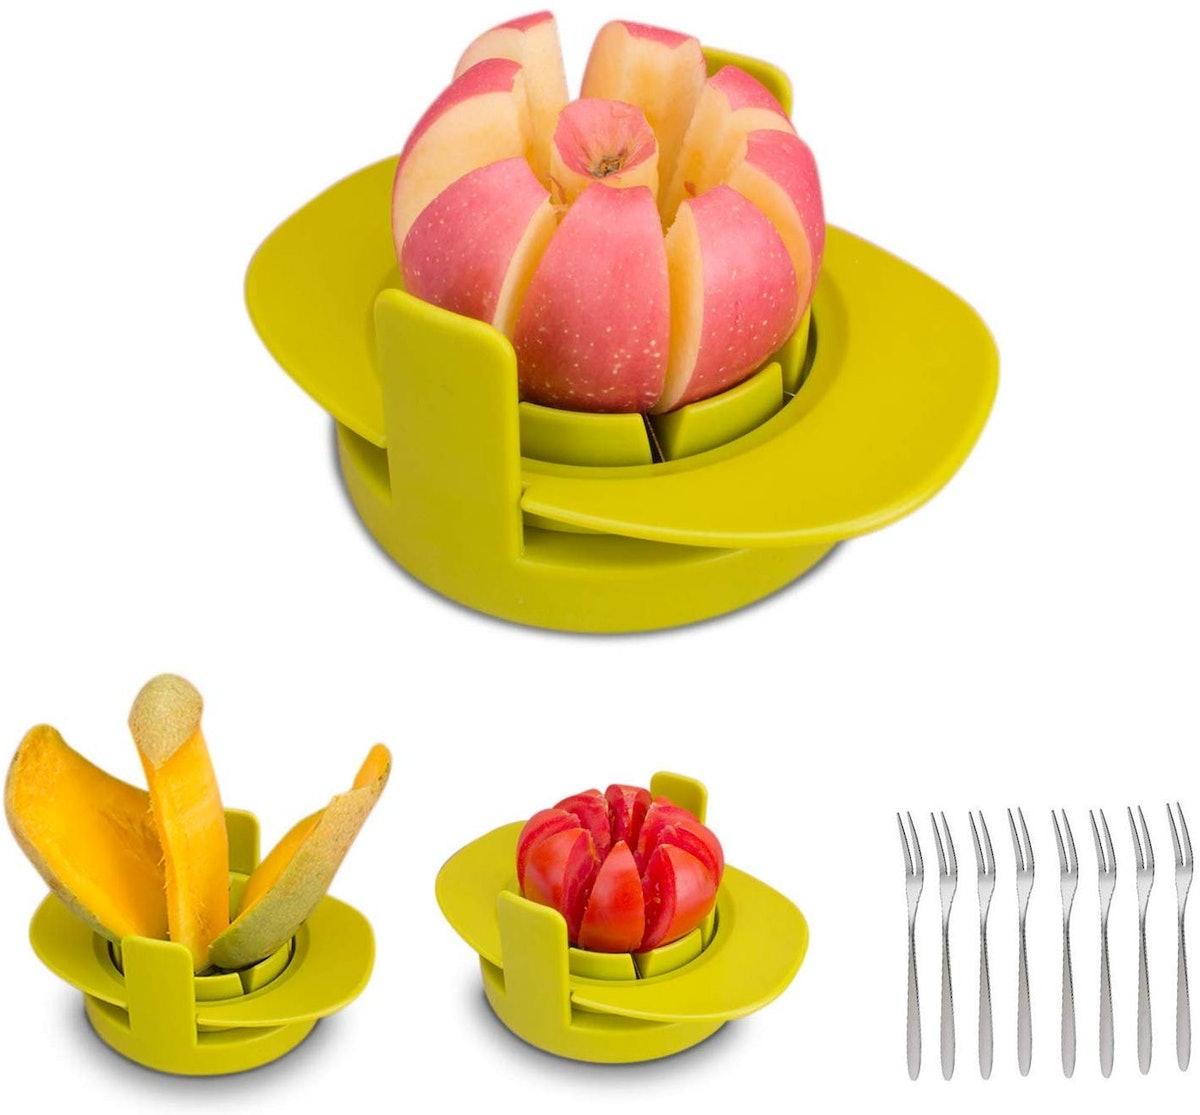 GIPTIME Fruit and Vegetable Slicer